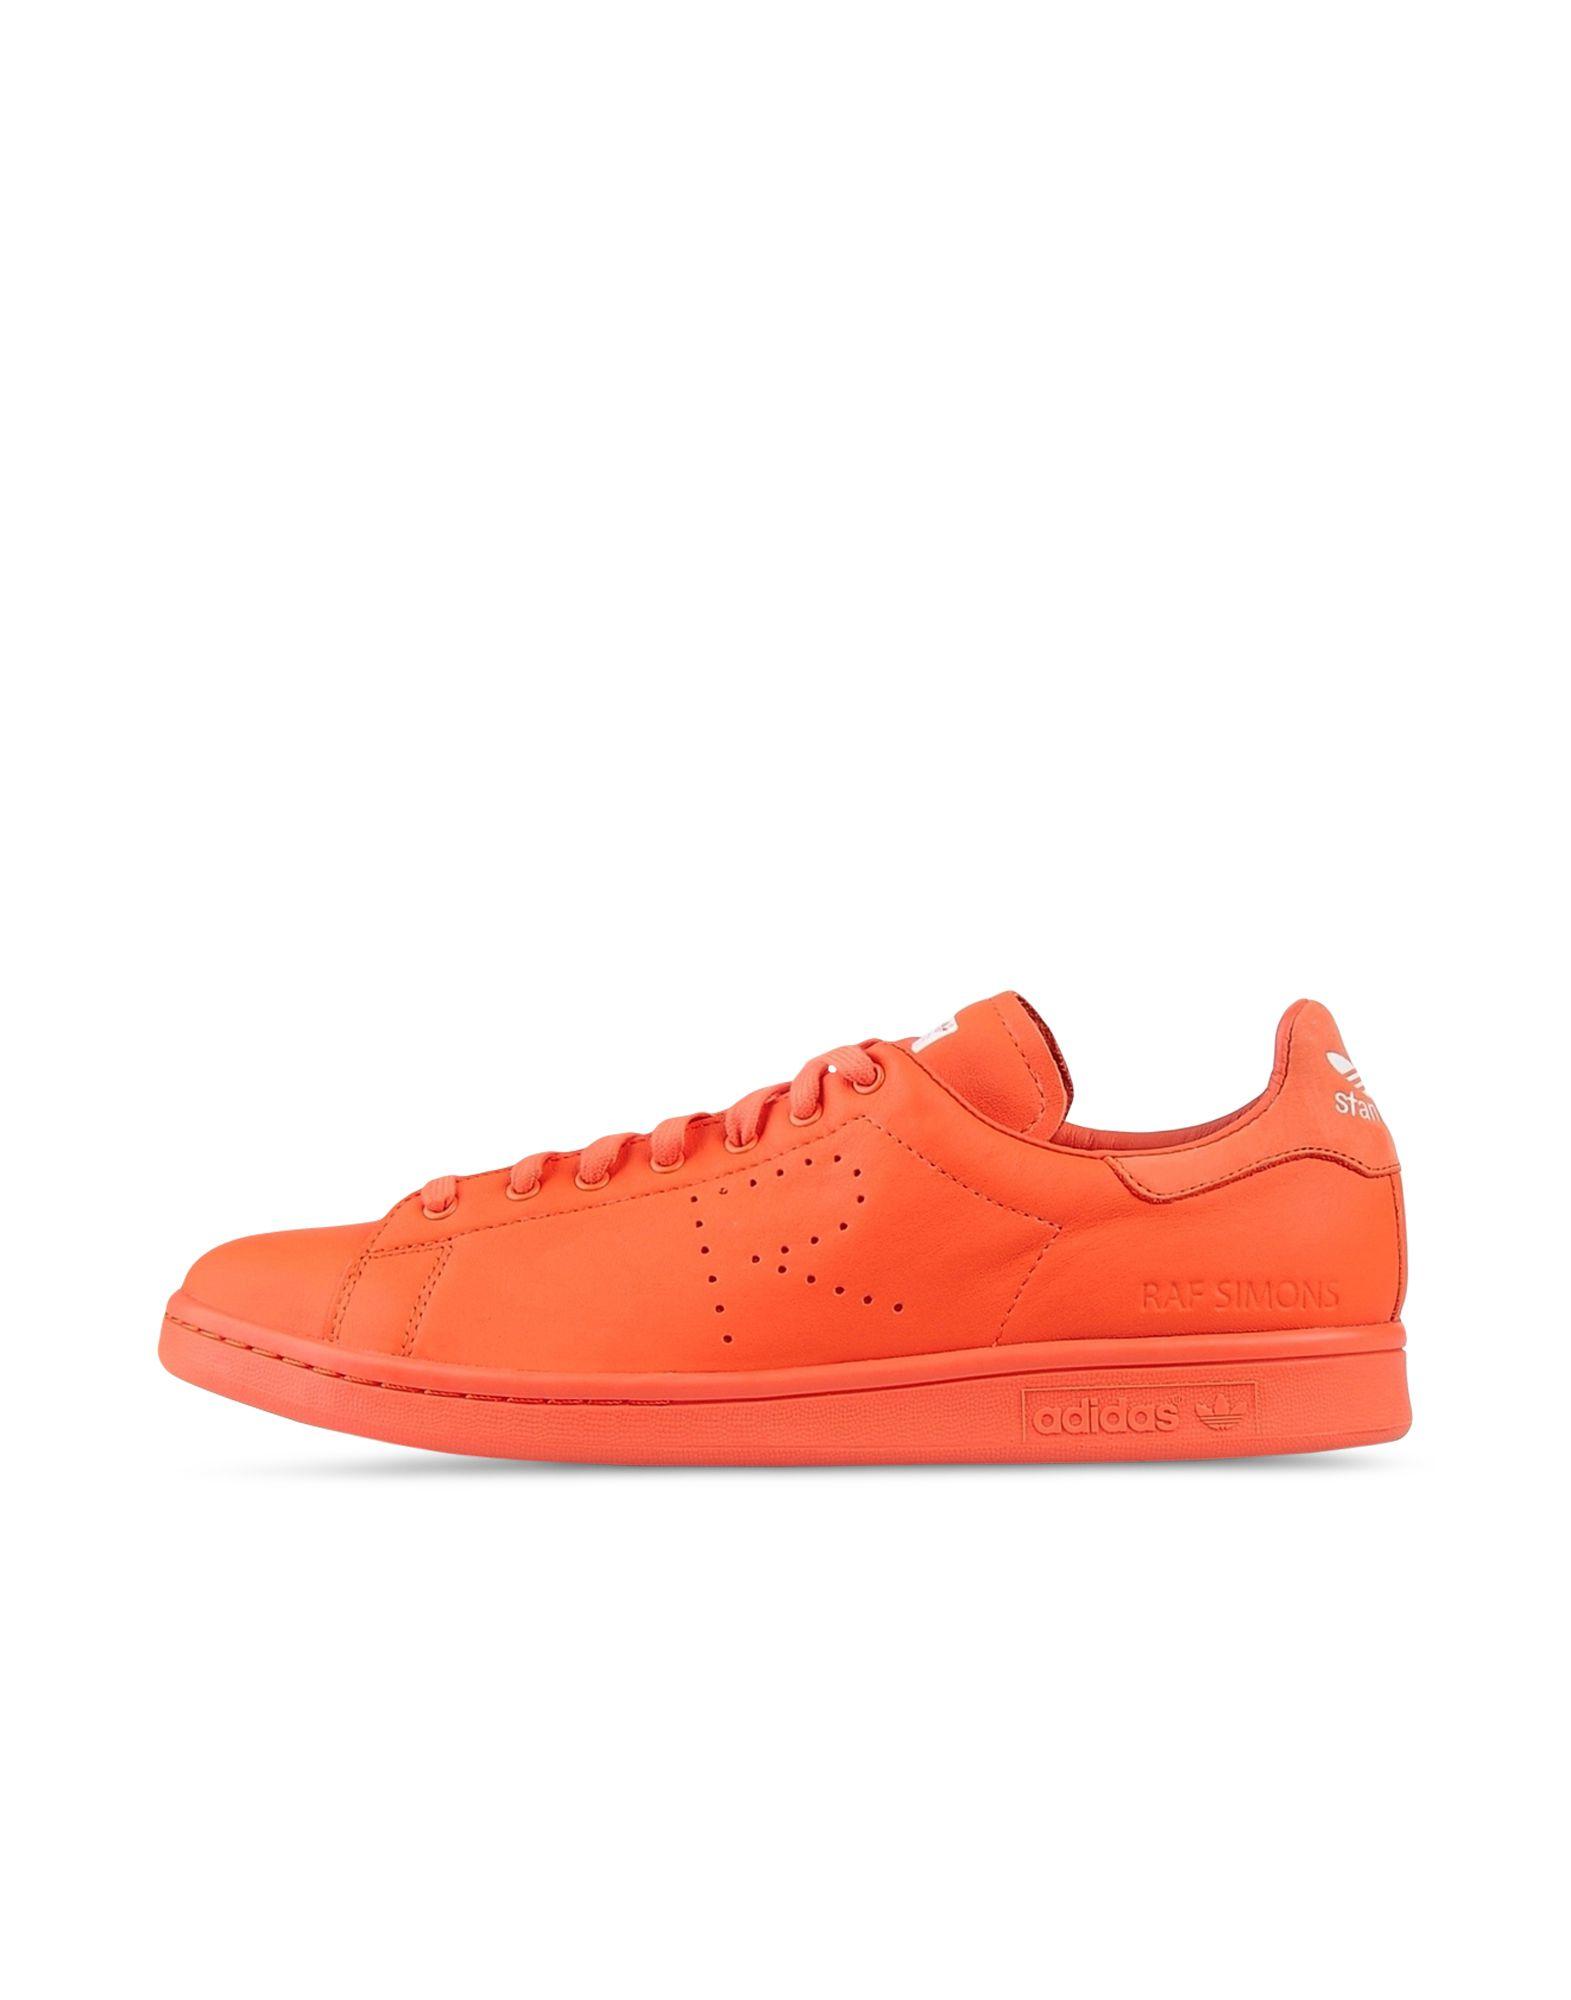 adidas stan smith orange. Black Bedroom Furniture Sets. Home Design Ideas